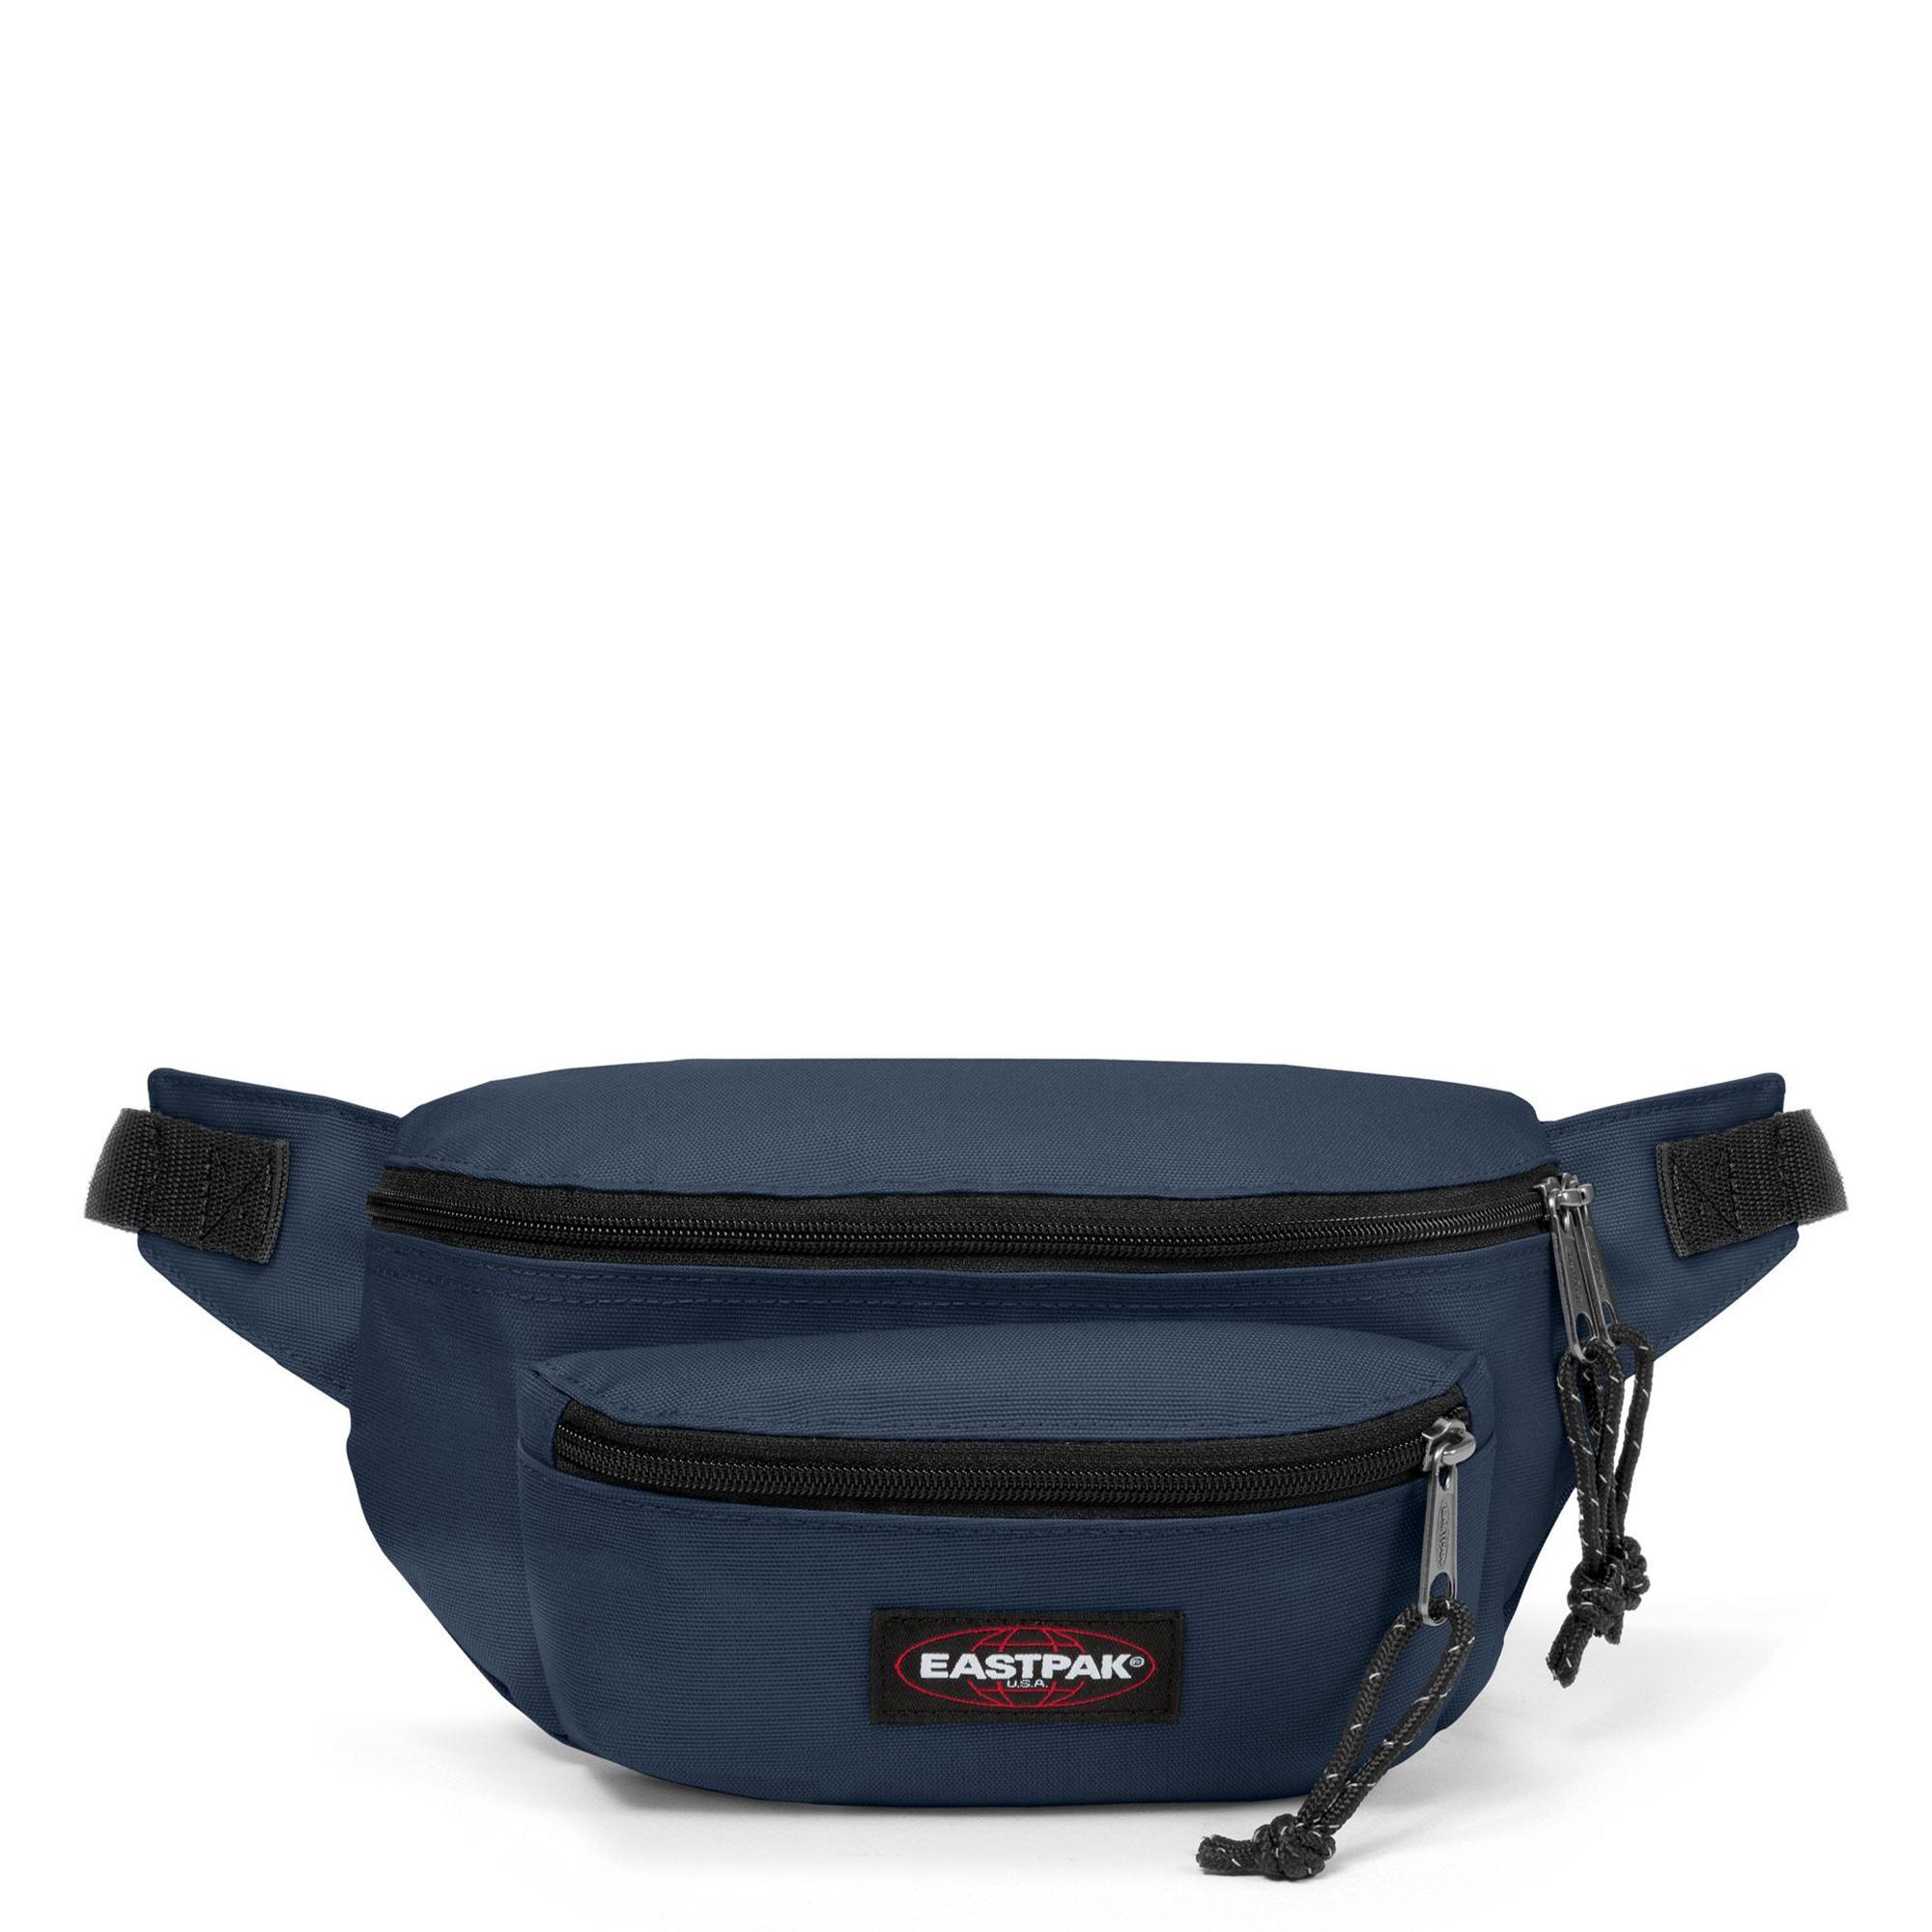 Eastpak Doggy Bag Frozen navy